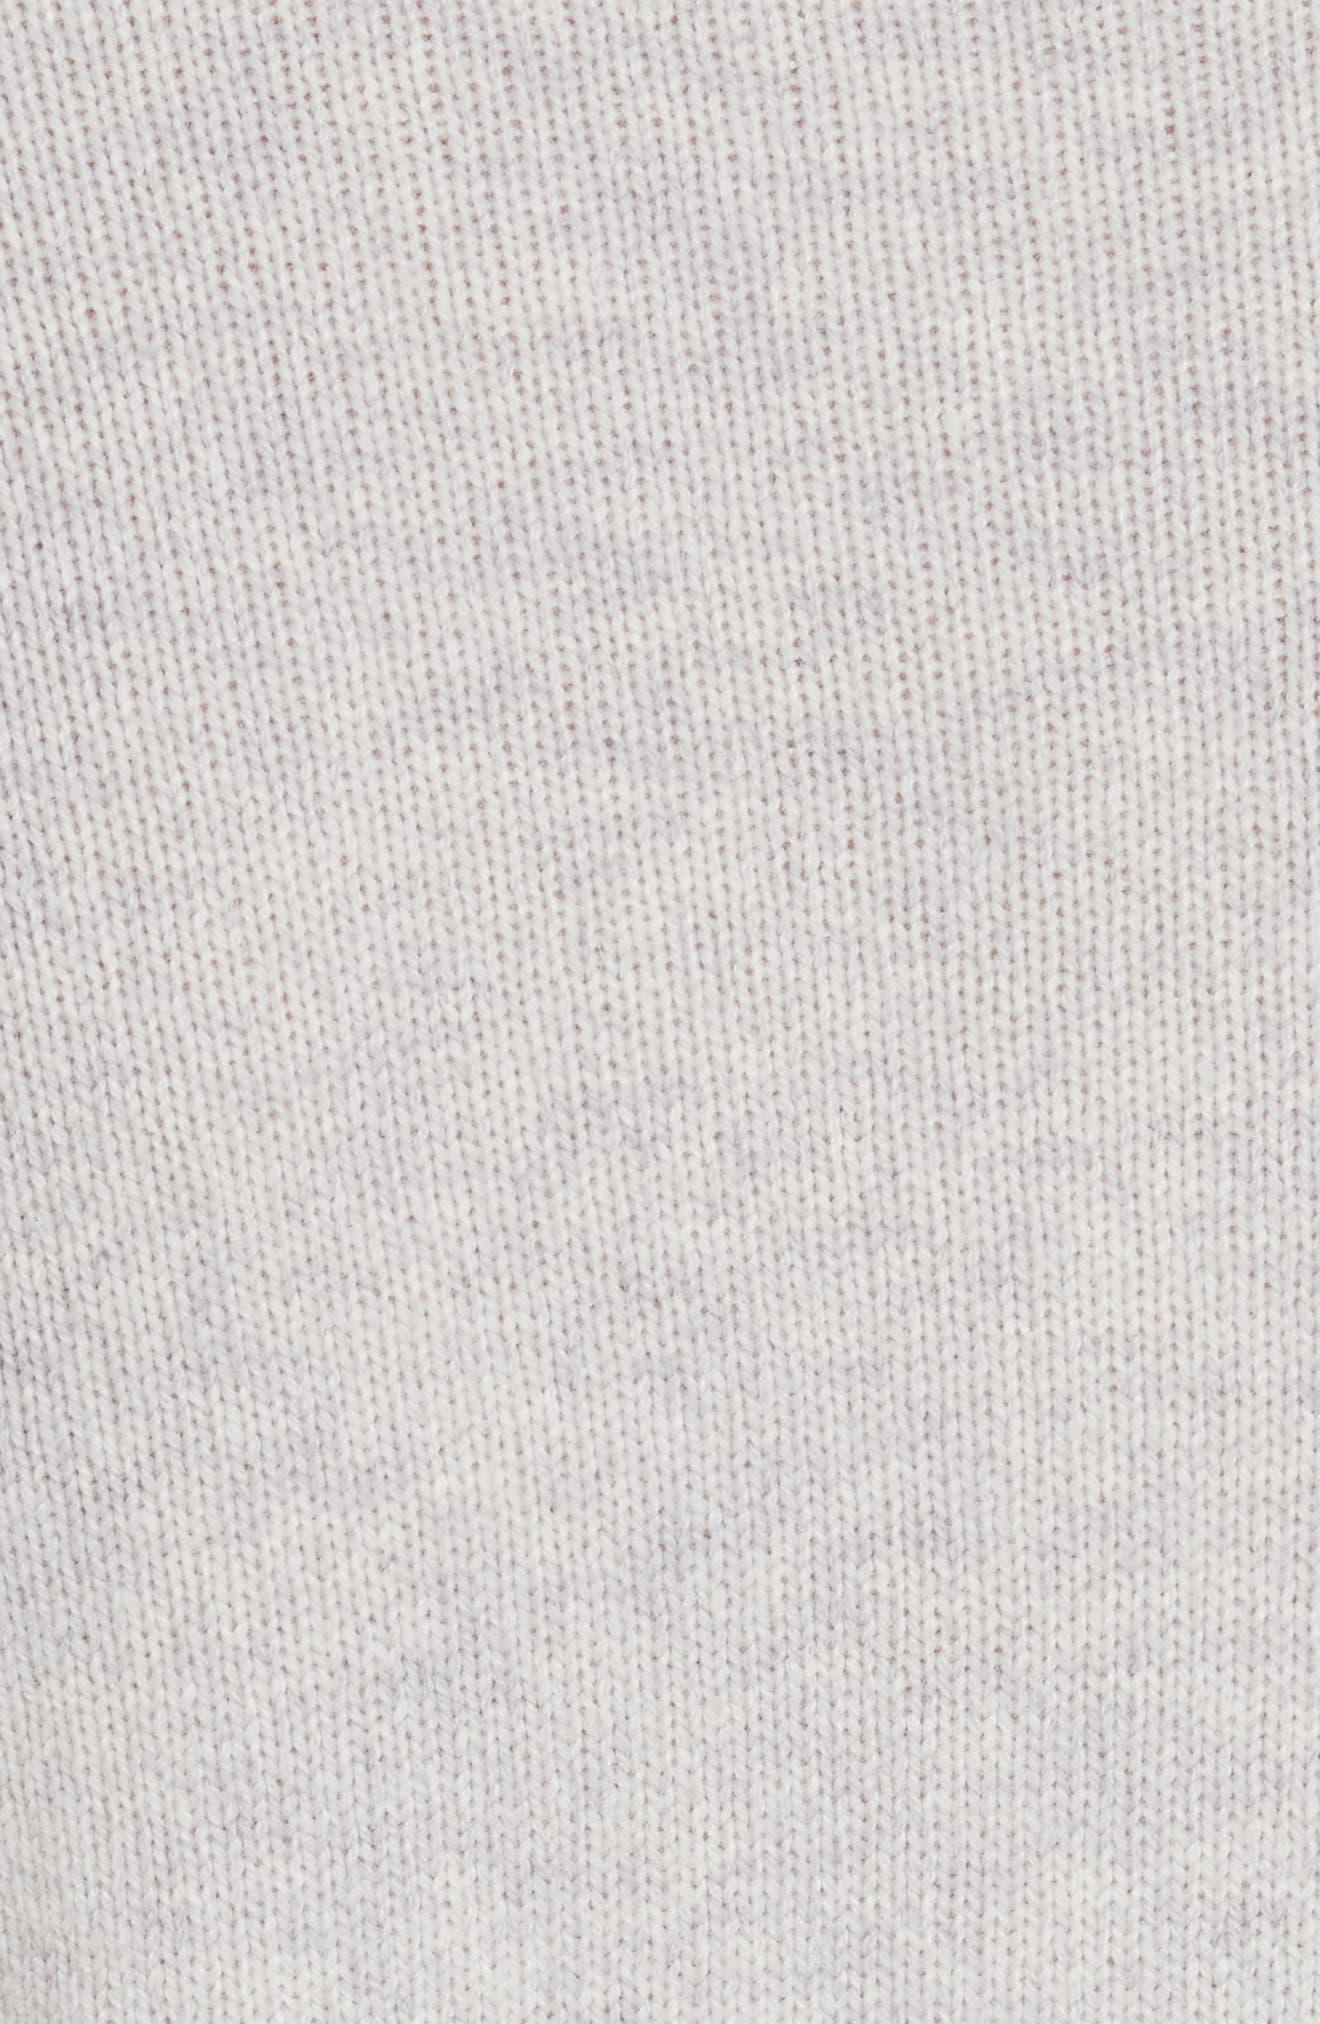 Lace Trim Knit Pullover,                             Alternate thumbnail 5, color,